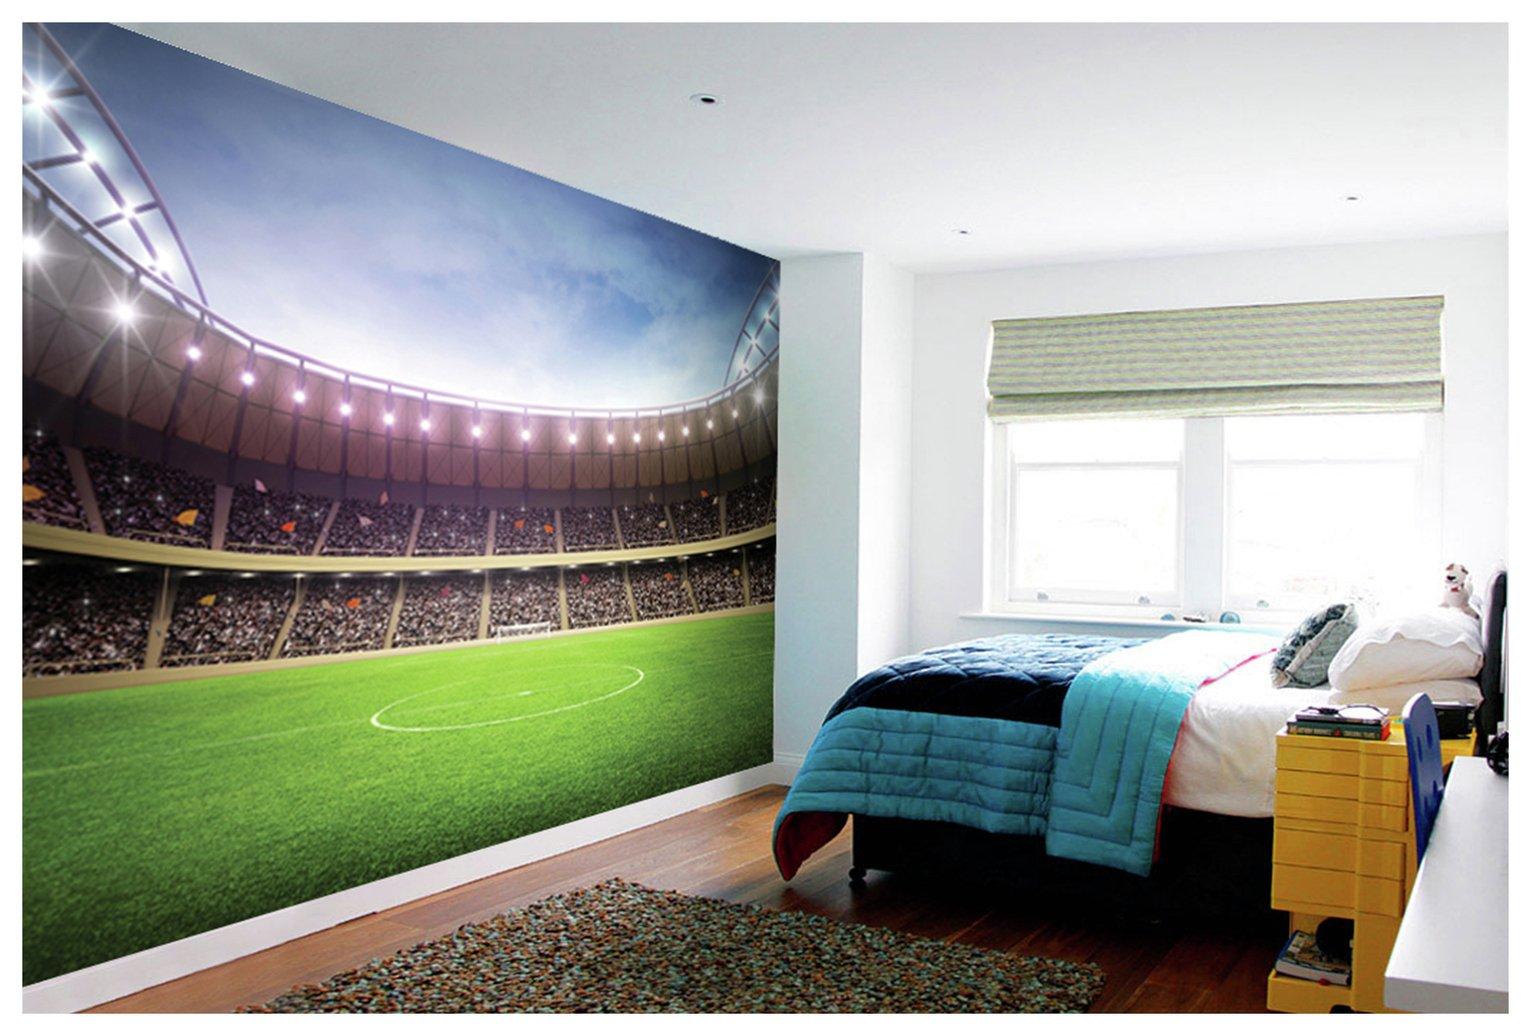 Buy 1Wall Football Stadium Wall Mural Murals and wall stickers Argos